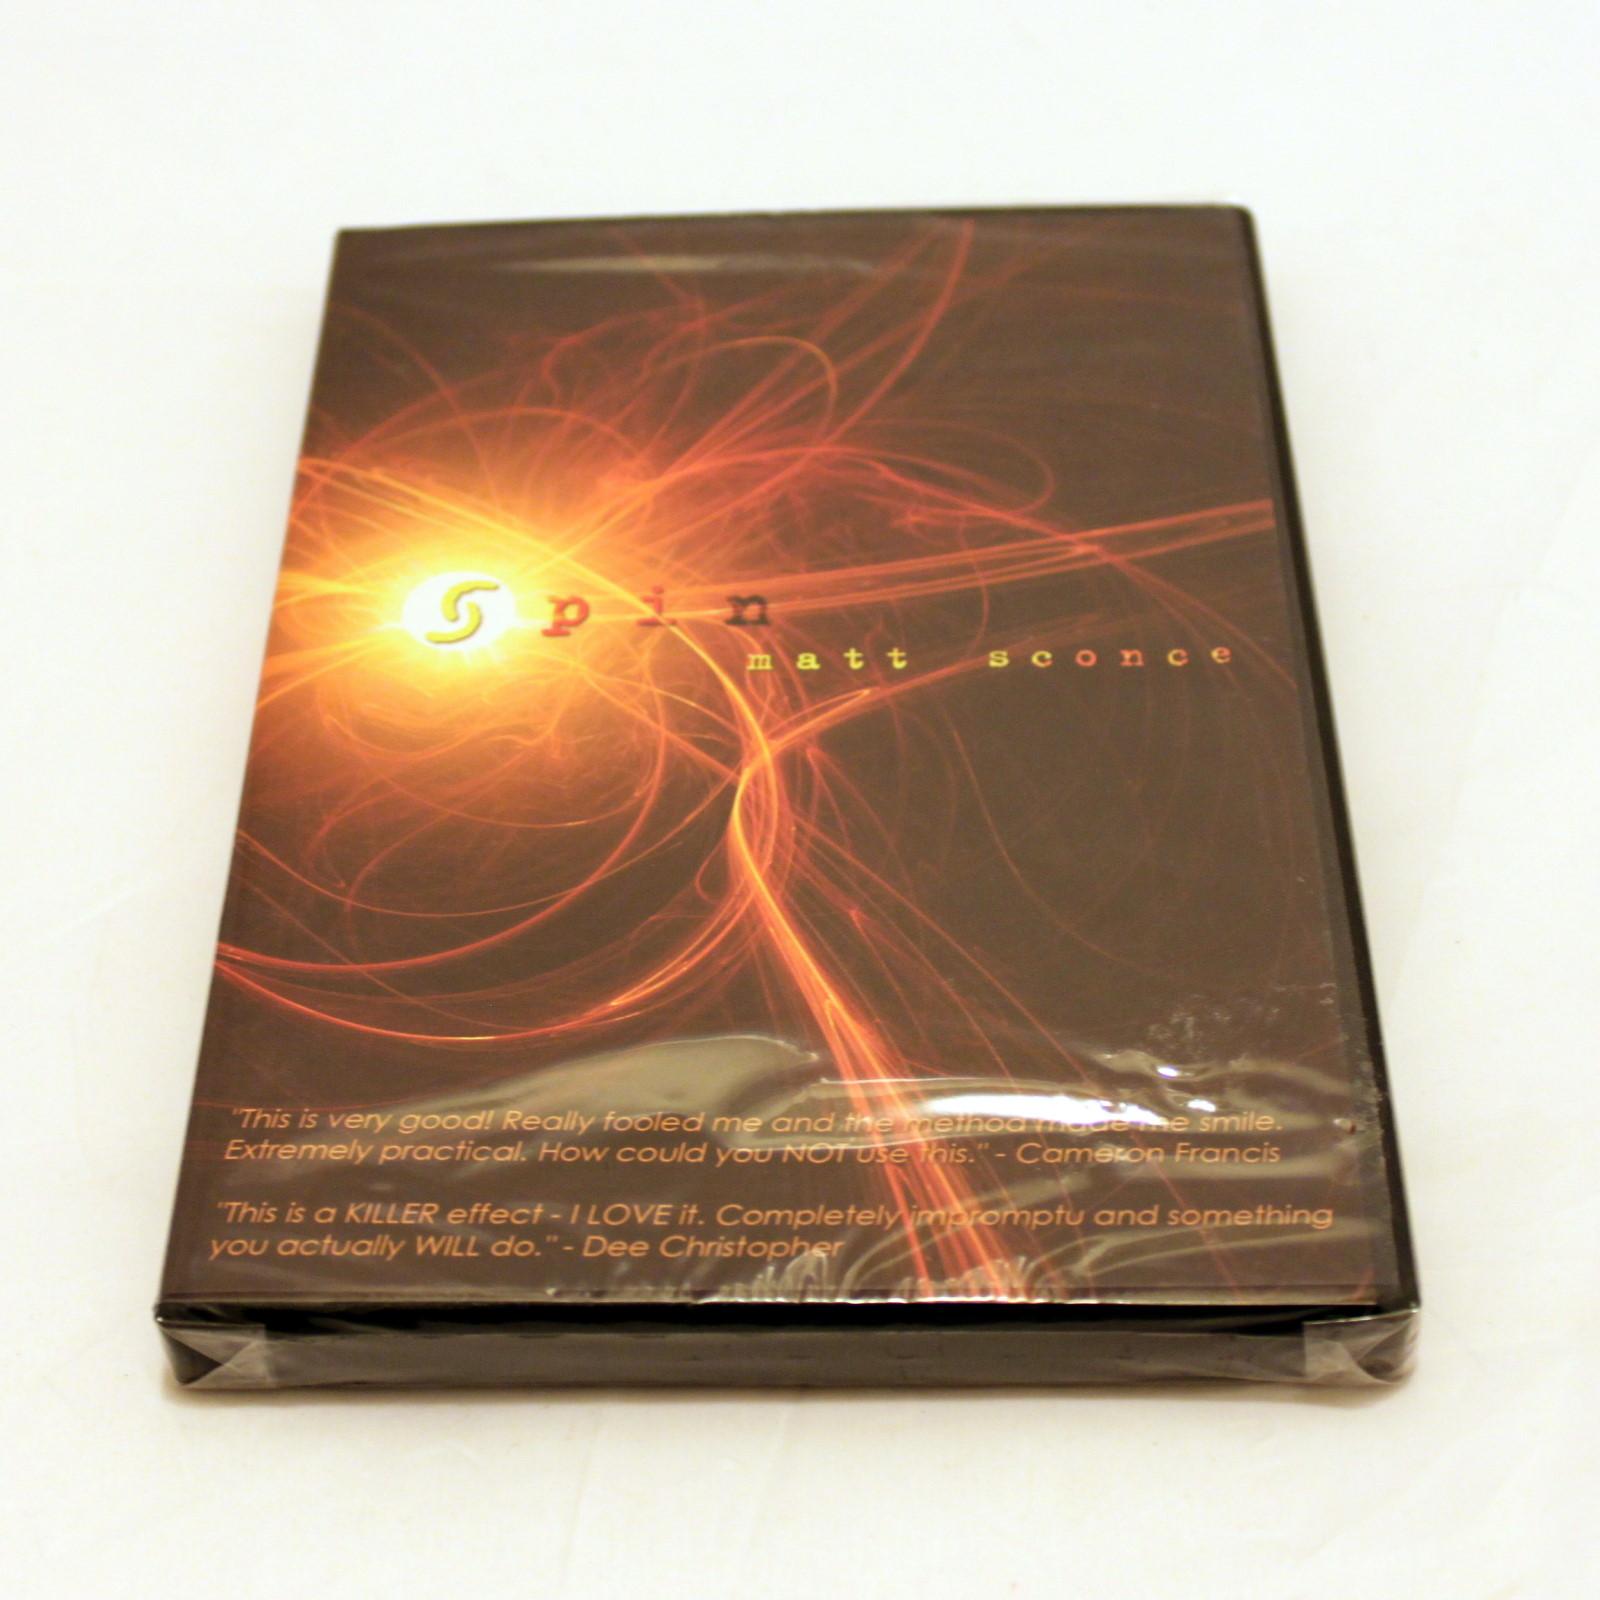 Spin DVD by Matt Sconce